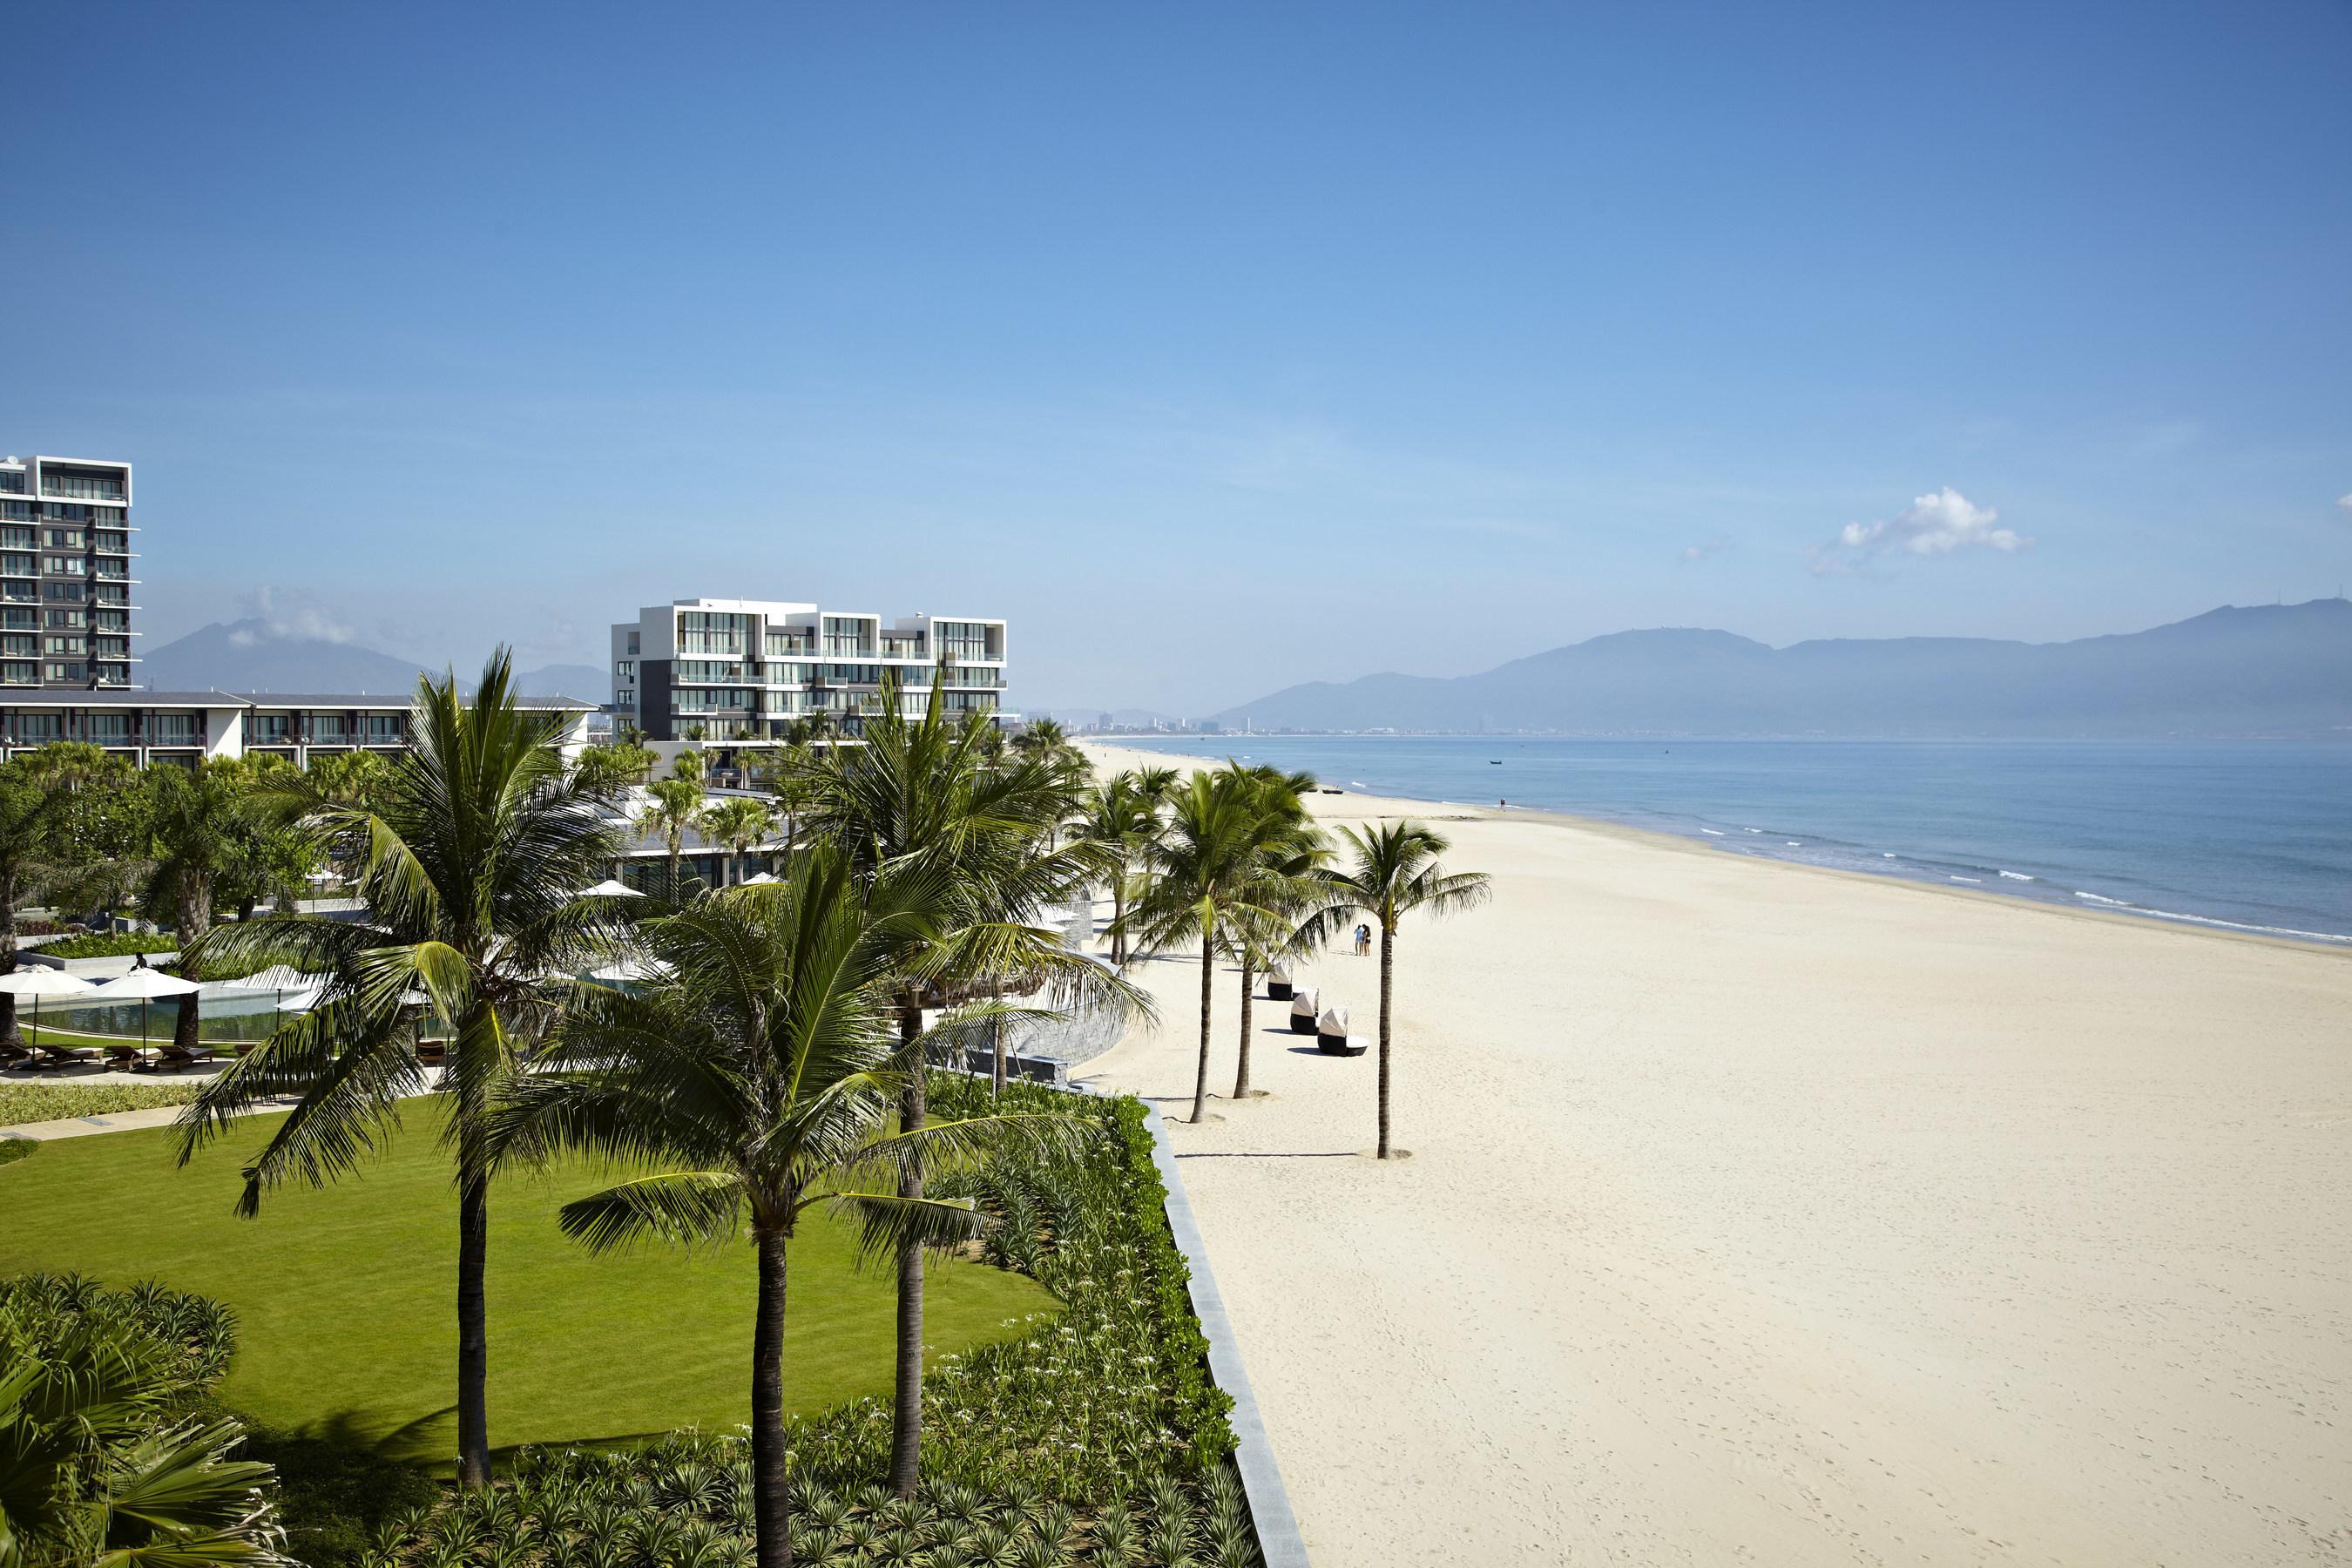 Hyatt Regency Danang Resort & Spa and unspoiled beaches of Vietnam's Central Coast